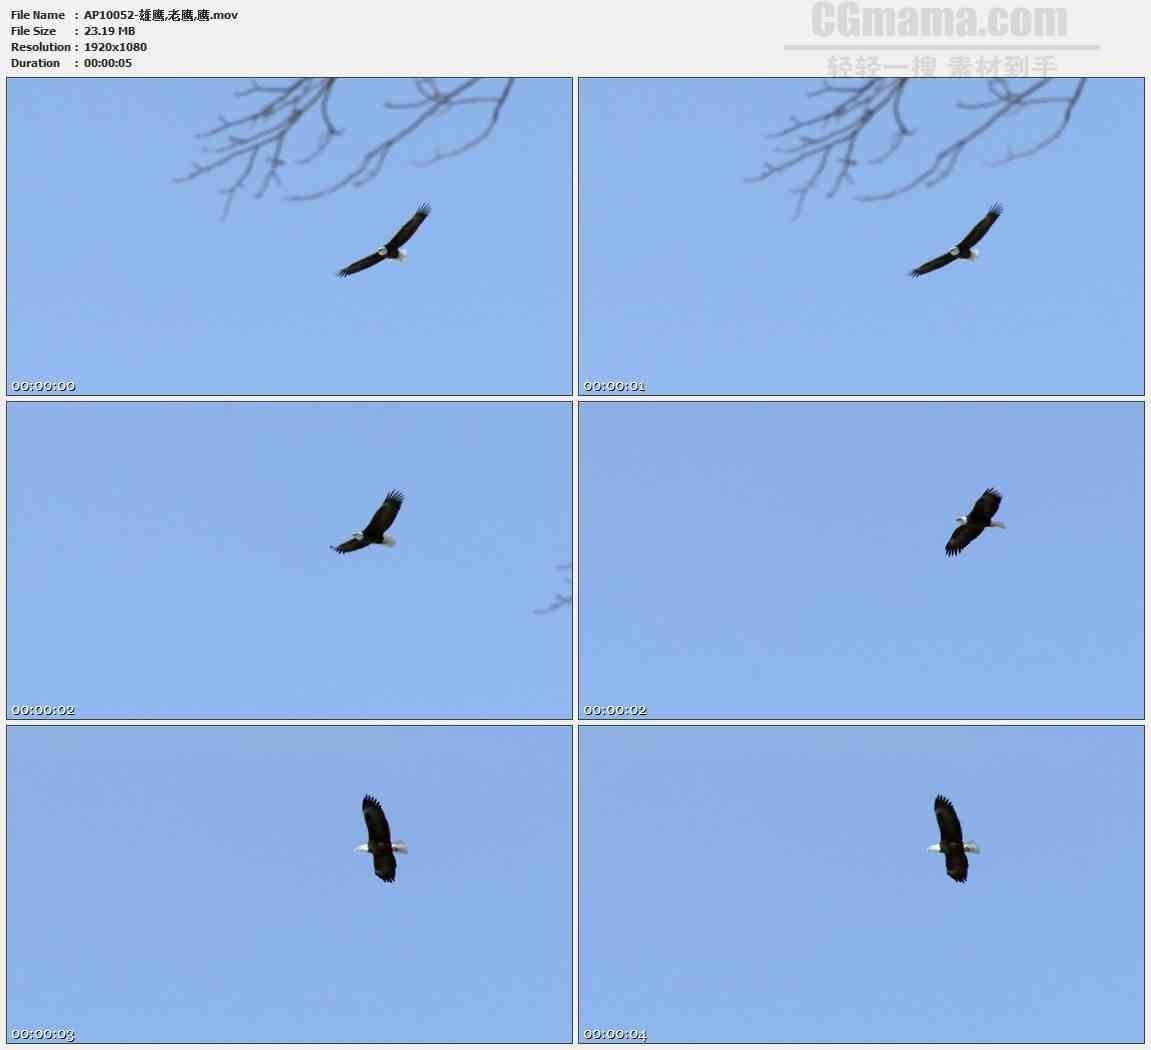 AP10052-雄鹰老鹰飞翔盘旋高清实拍视频素材